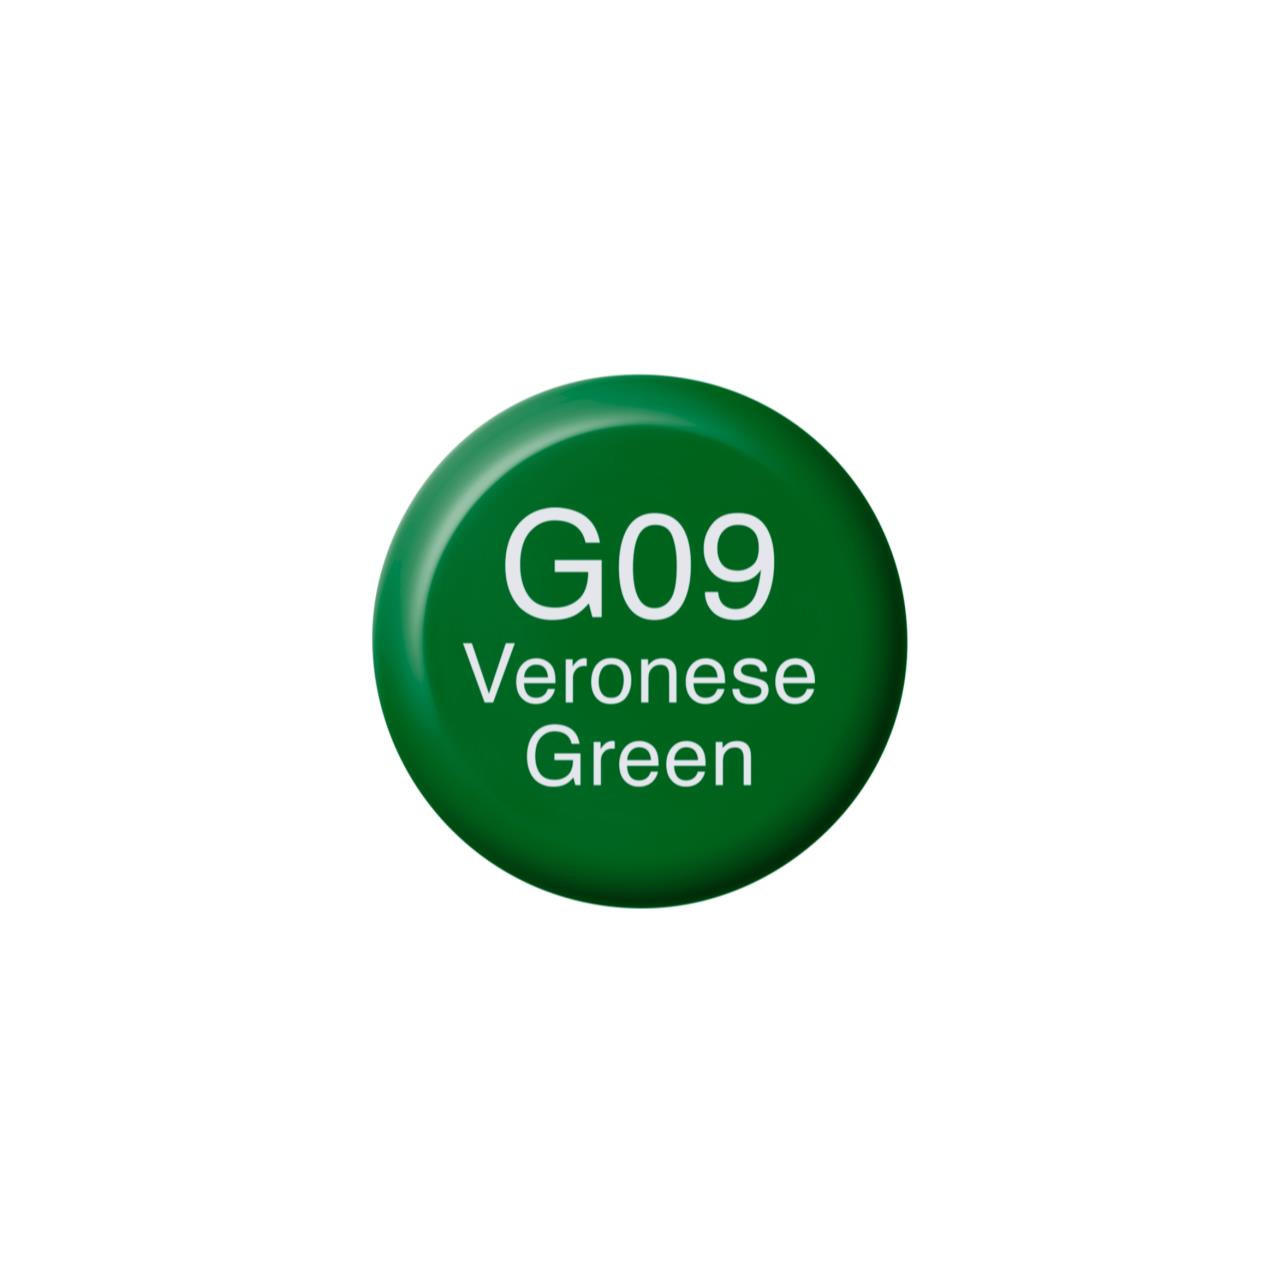 G09 Veronese Green, Copic Ink - 4511338057186